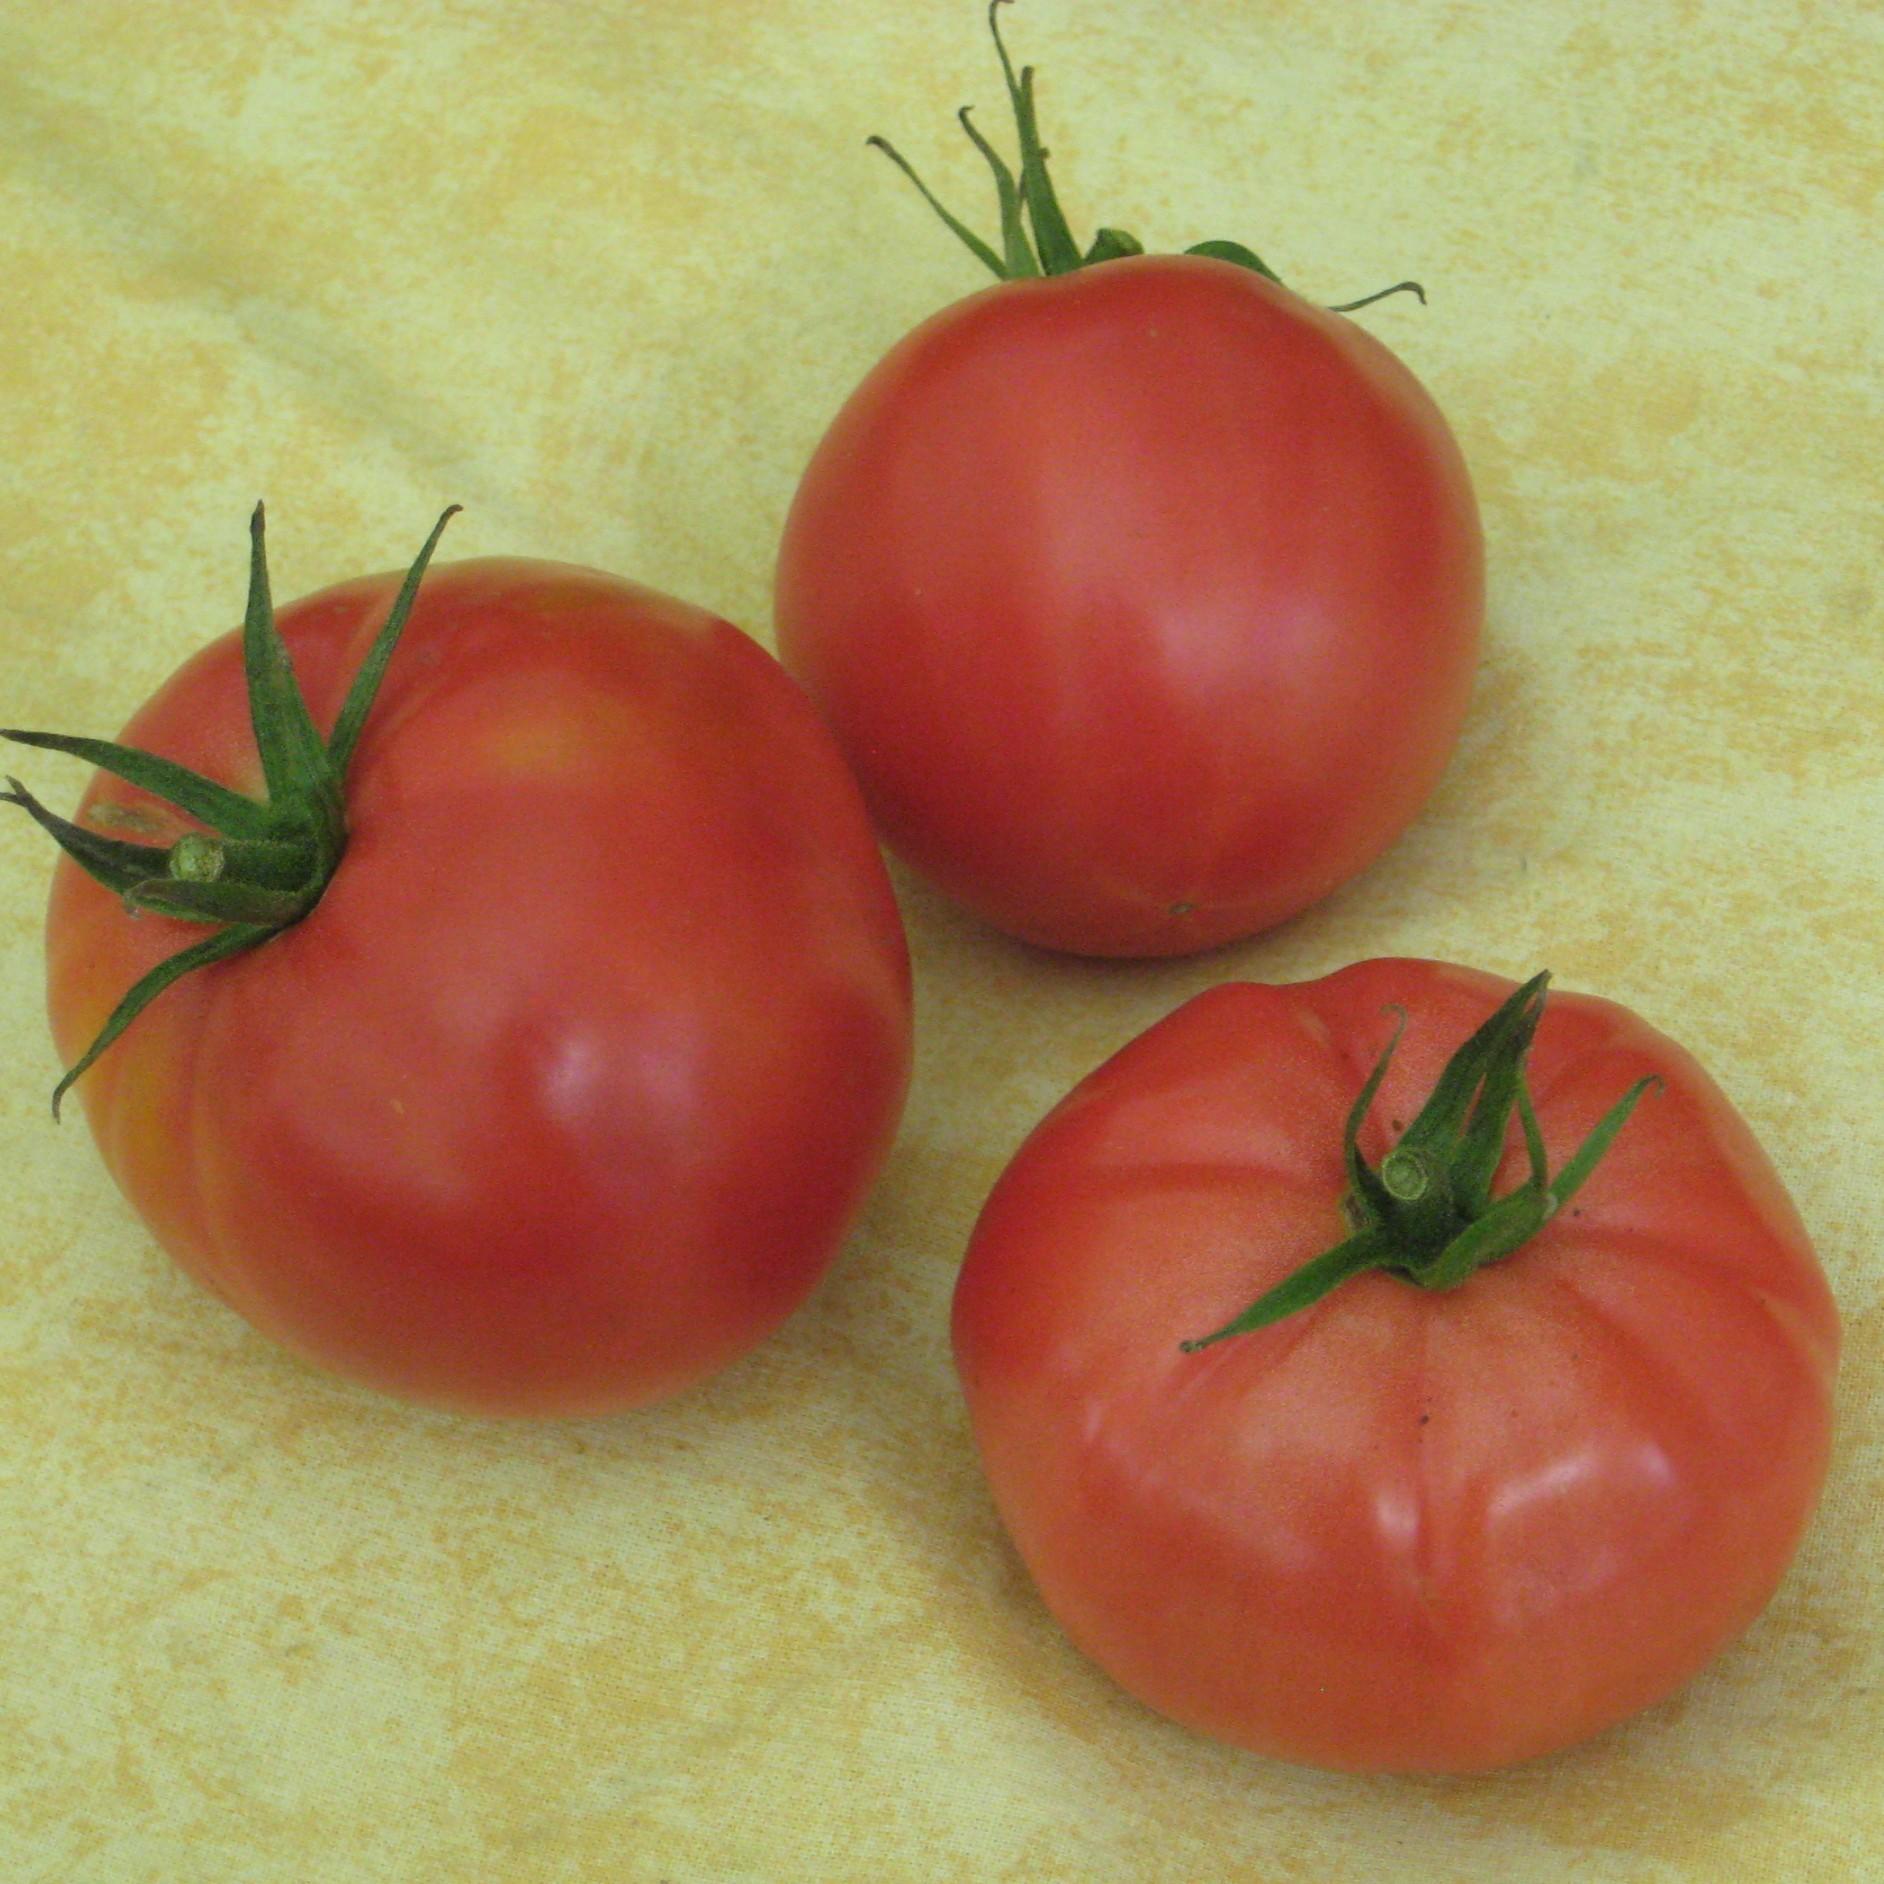 fleischtomate berner rose fleischtomaten tomaten. Black Bedroom Furniture Sets. Home Design Ideas